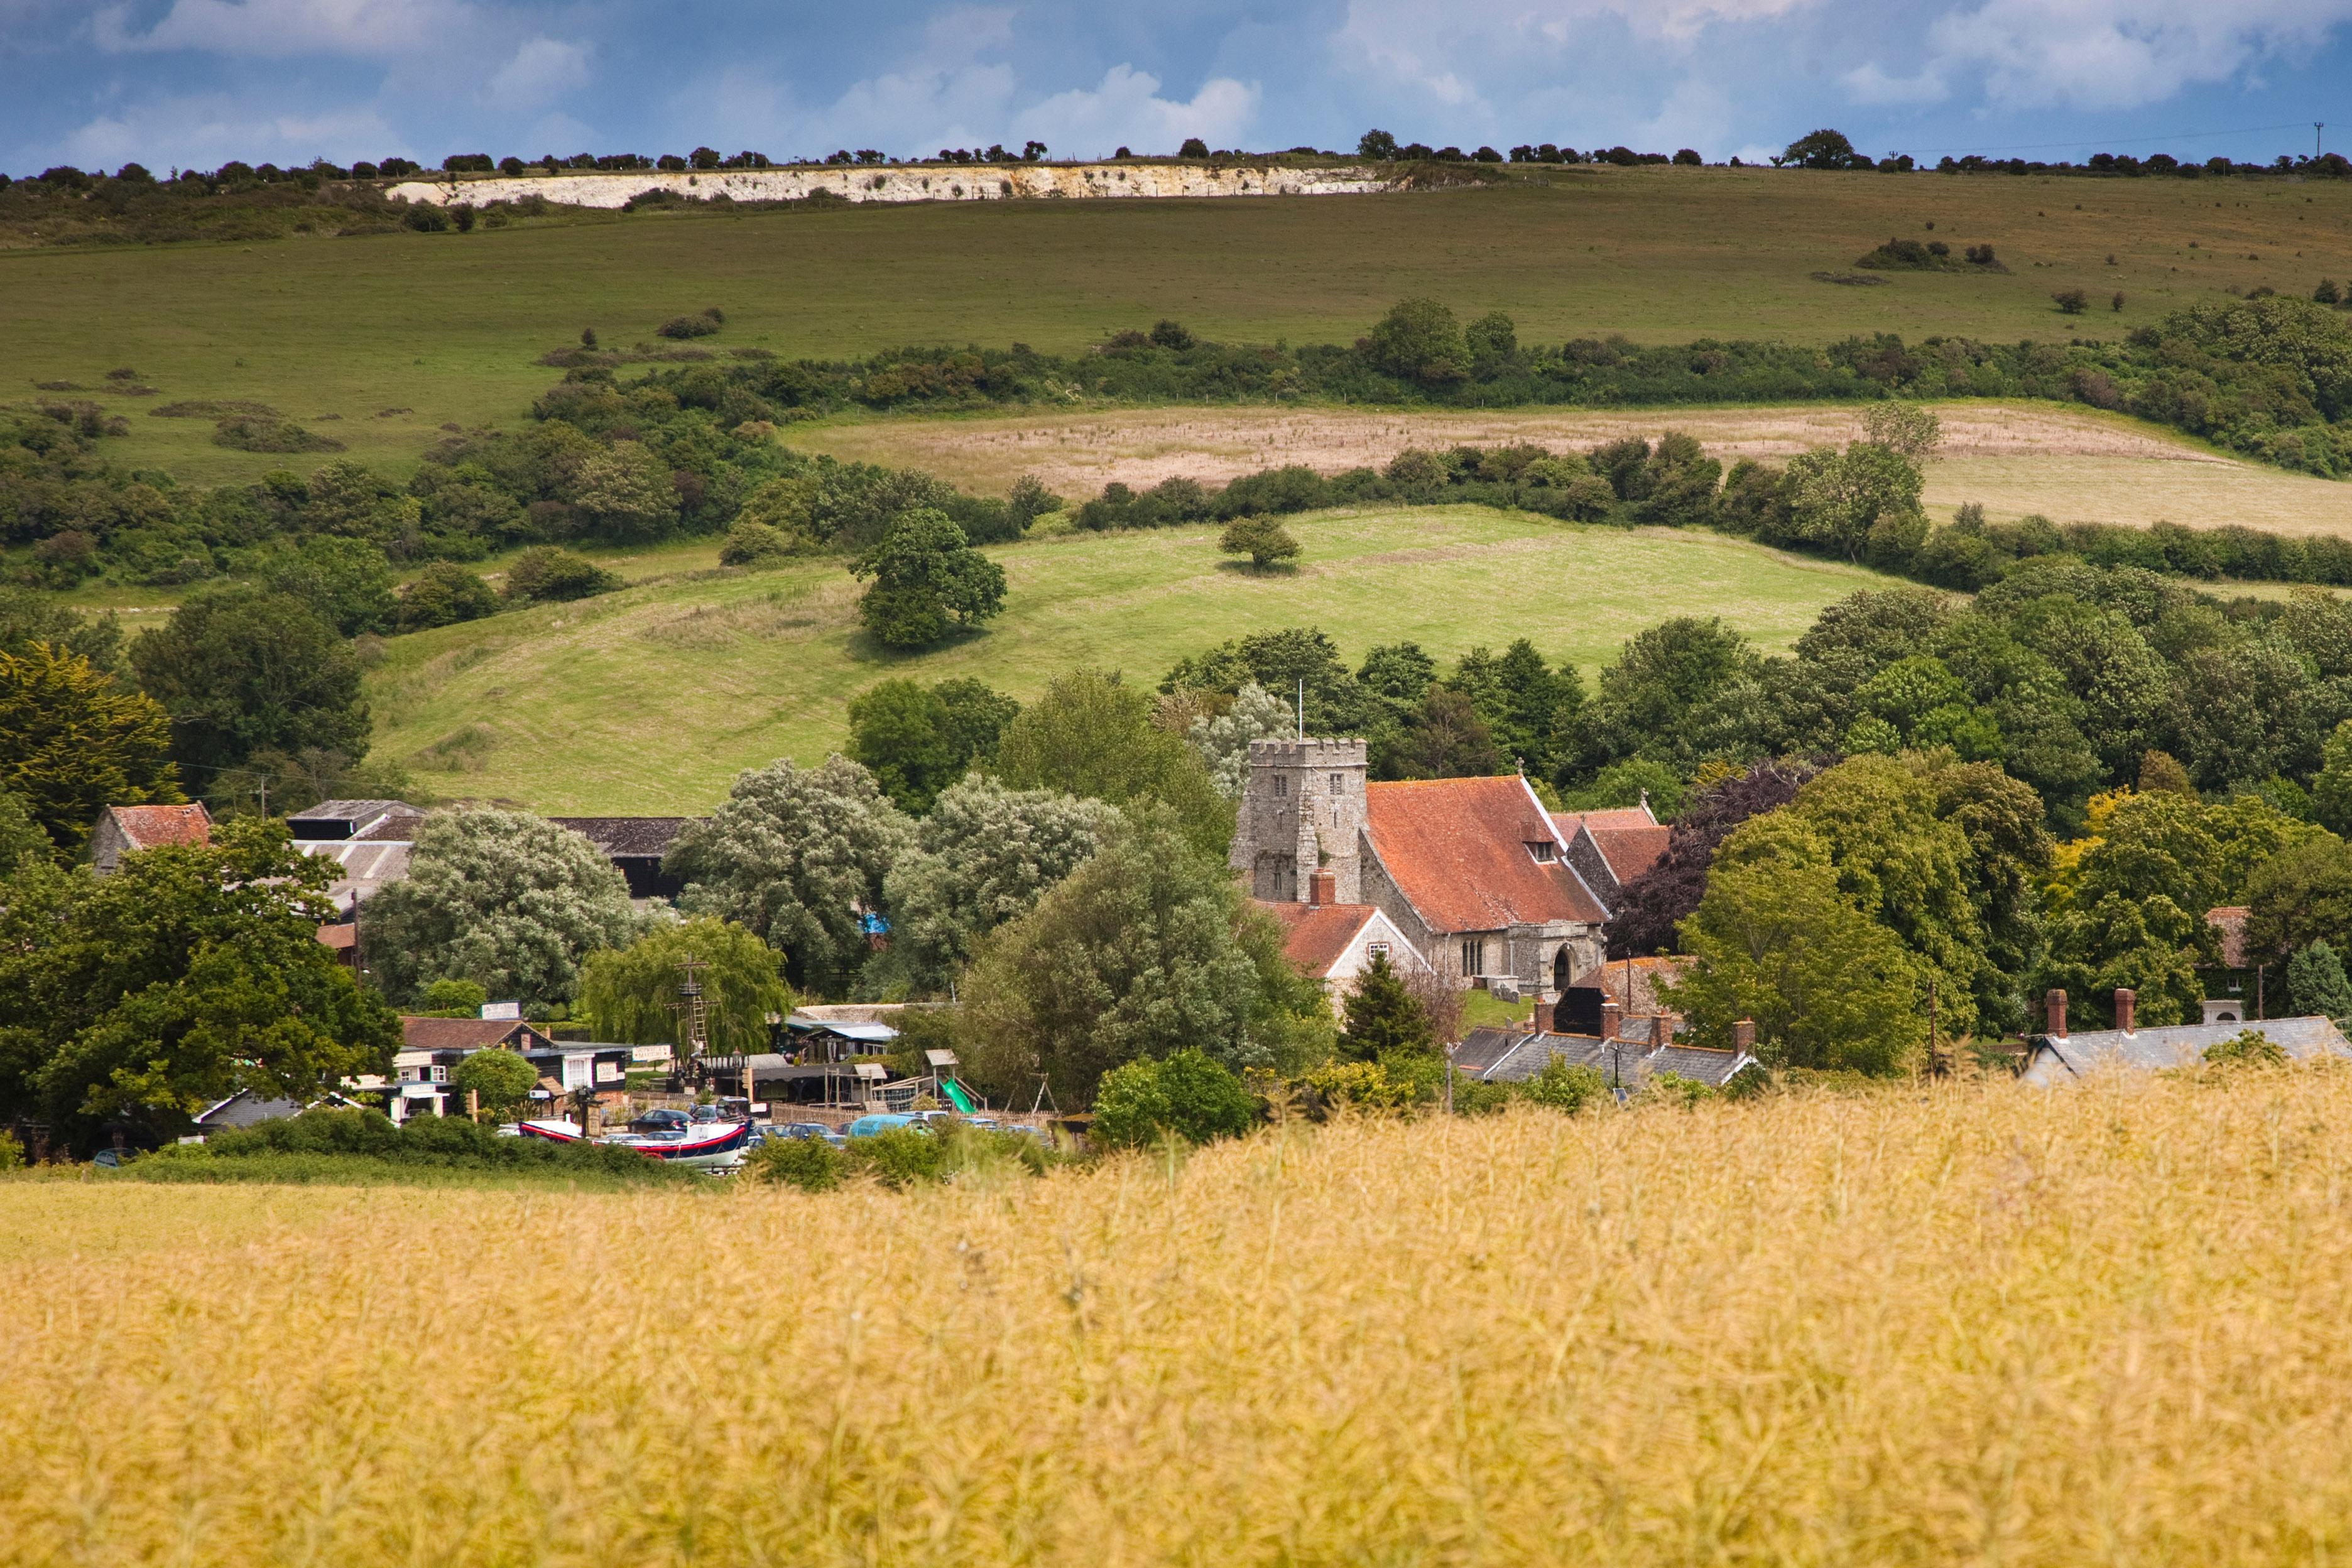 Arreton Barns View